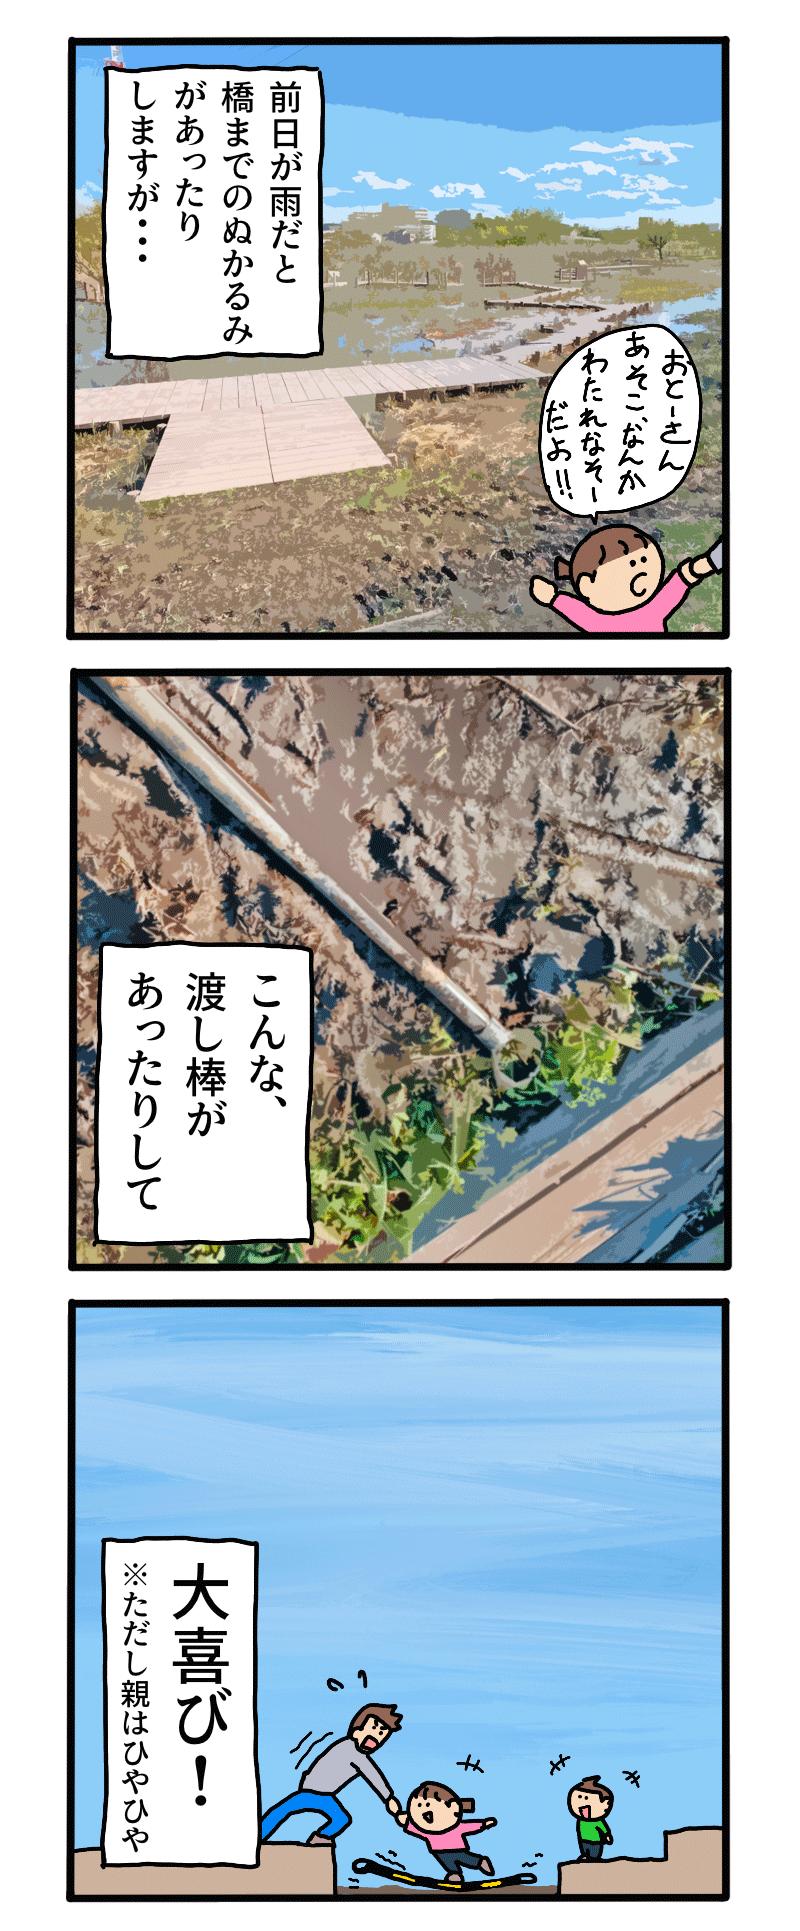 三橋総合公園のWEB漫画前日が雨